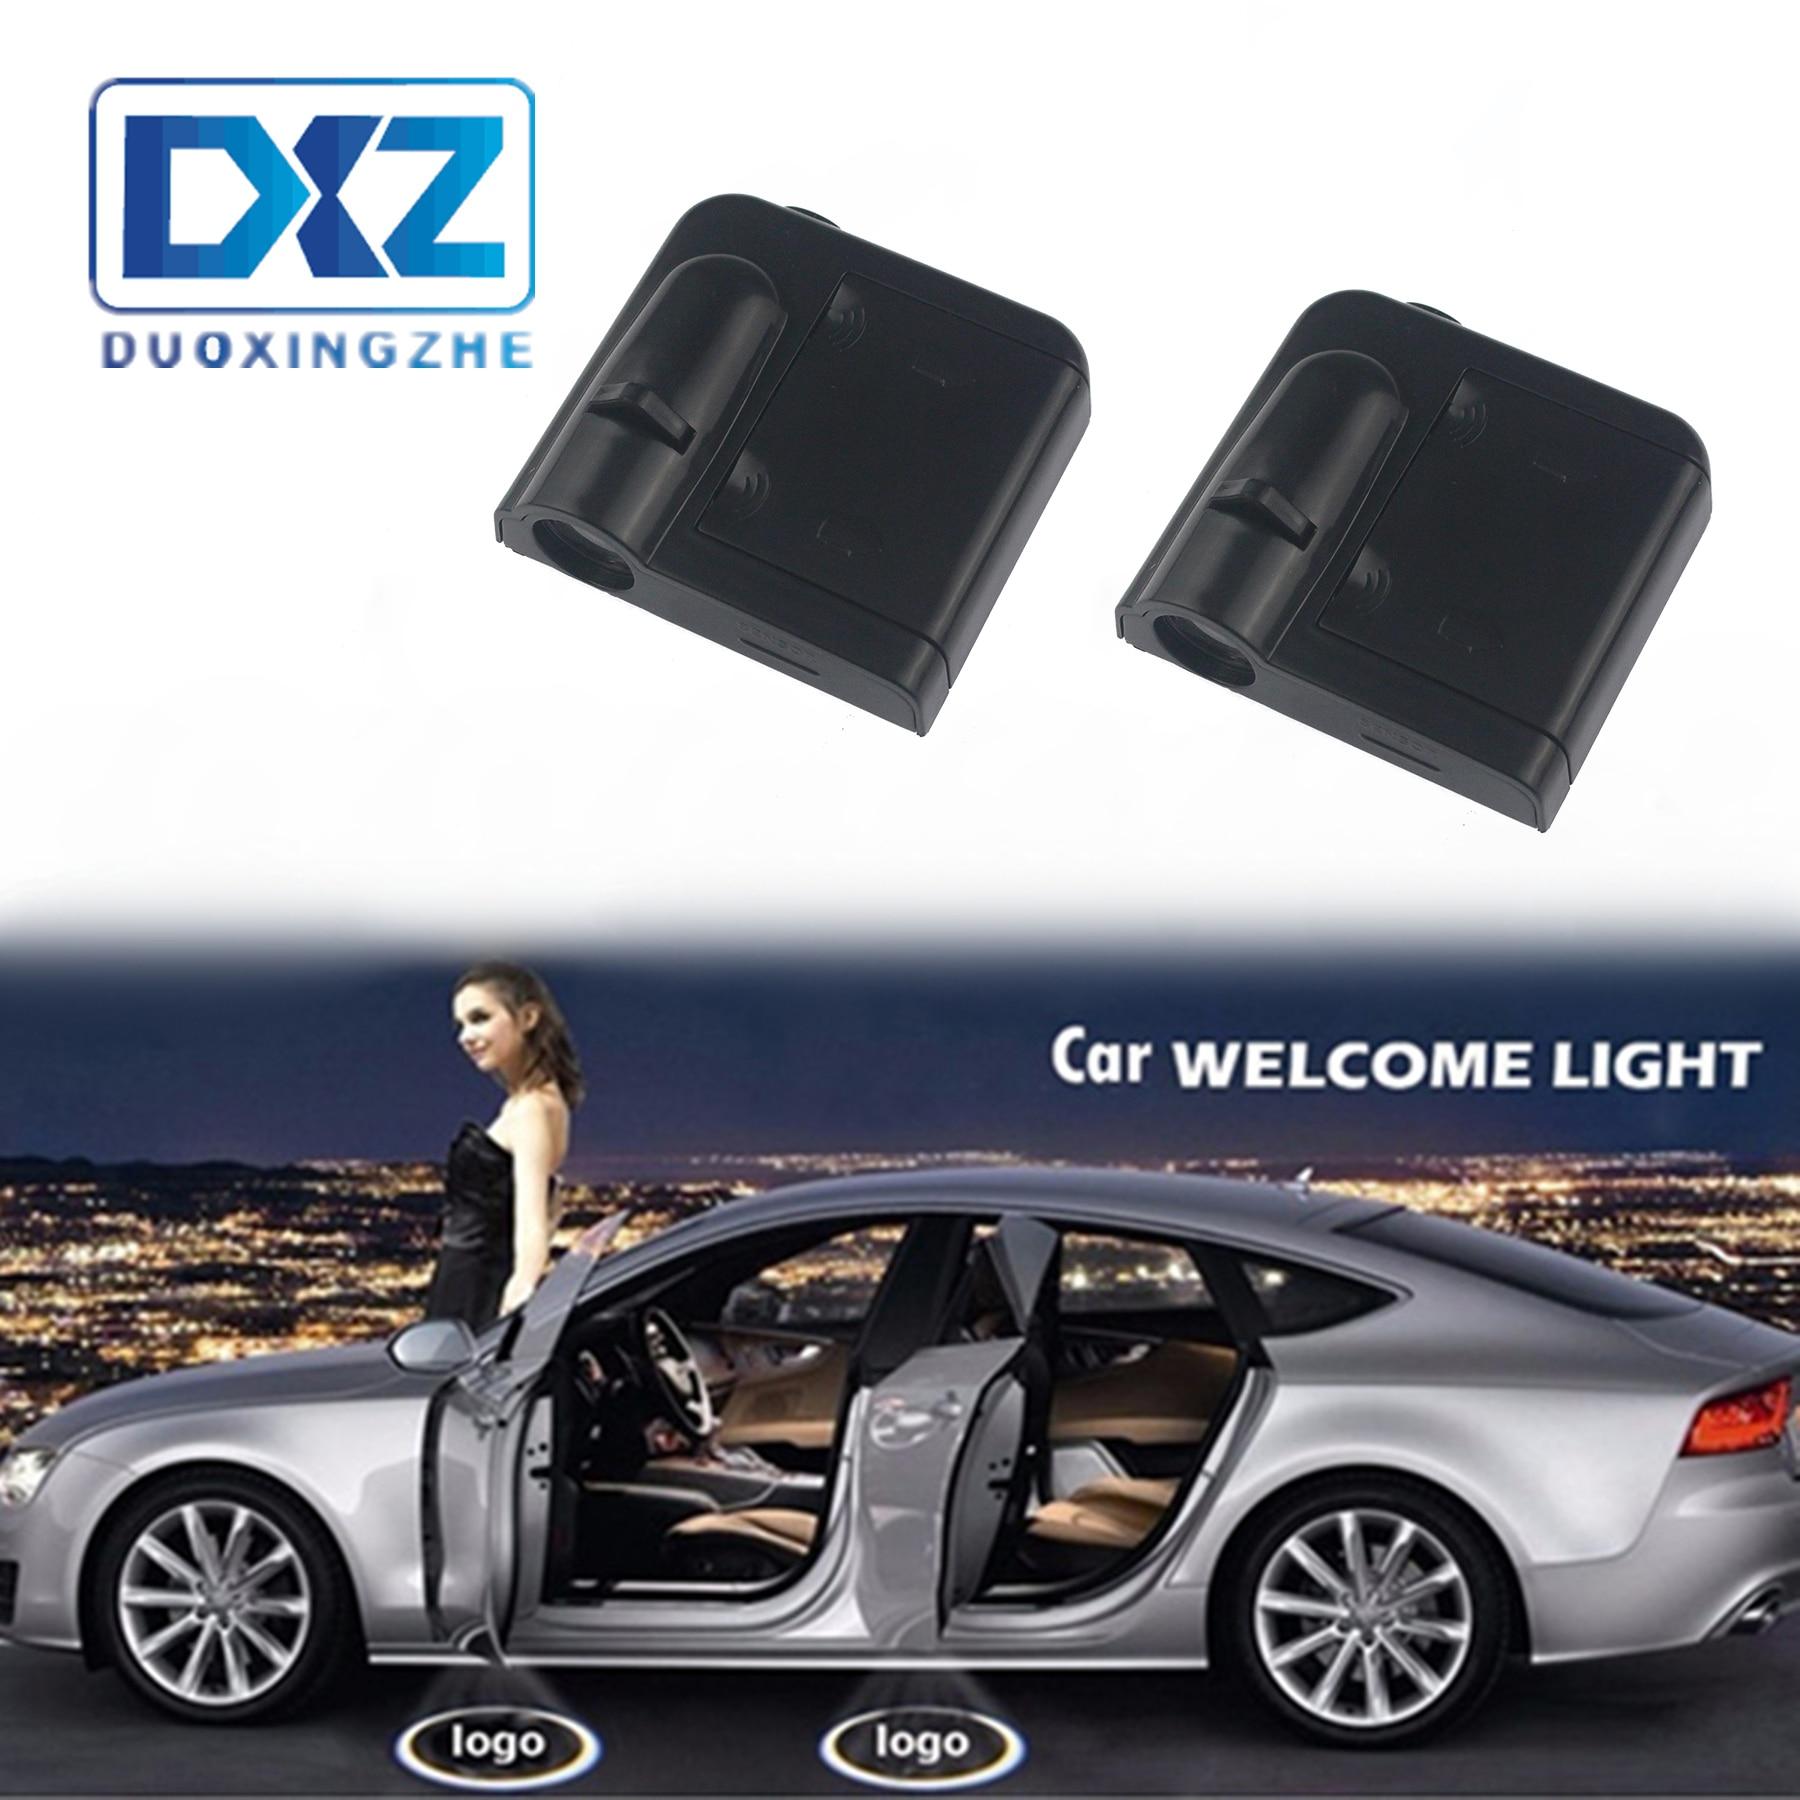 2X Car Door Projector Foot Lighting Welcome Laser Logo Ghost Shadow LED For Fiat Opel Suzuki Tesla Roewe Chrysler Volvo Mazda VW